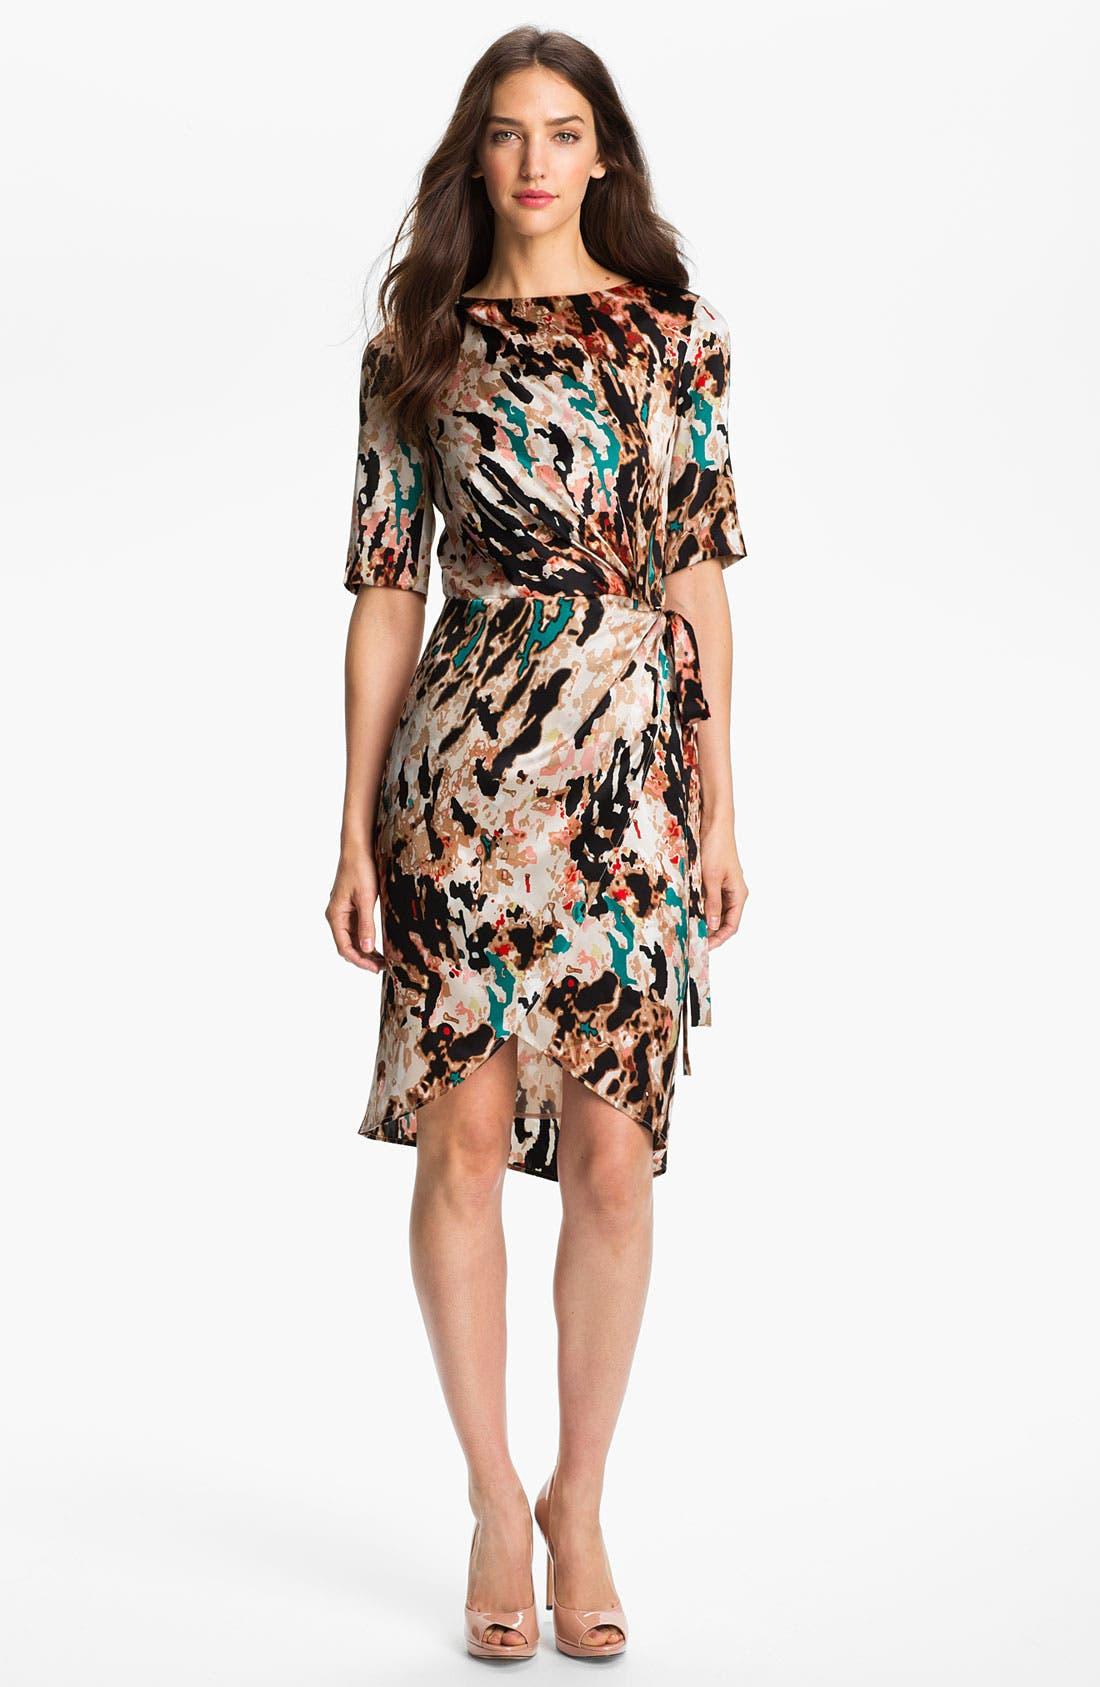 Alternate Image 1 Selected - Rachel Roy 'Fragmented Landscape' Print Silk Dress